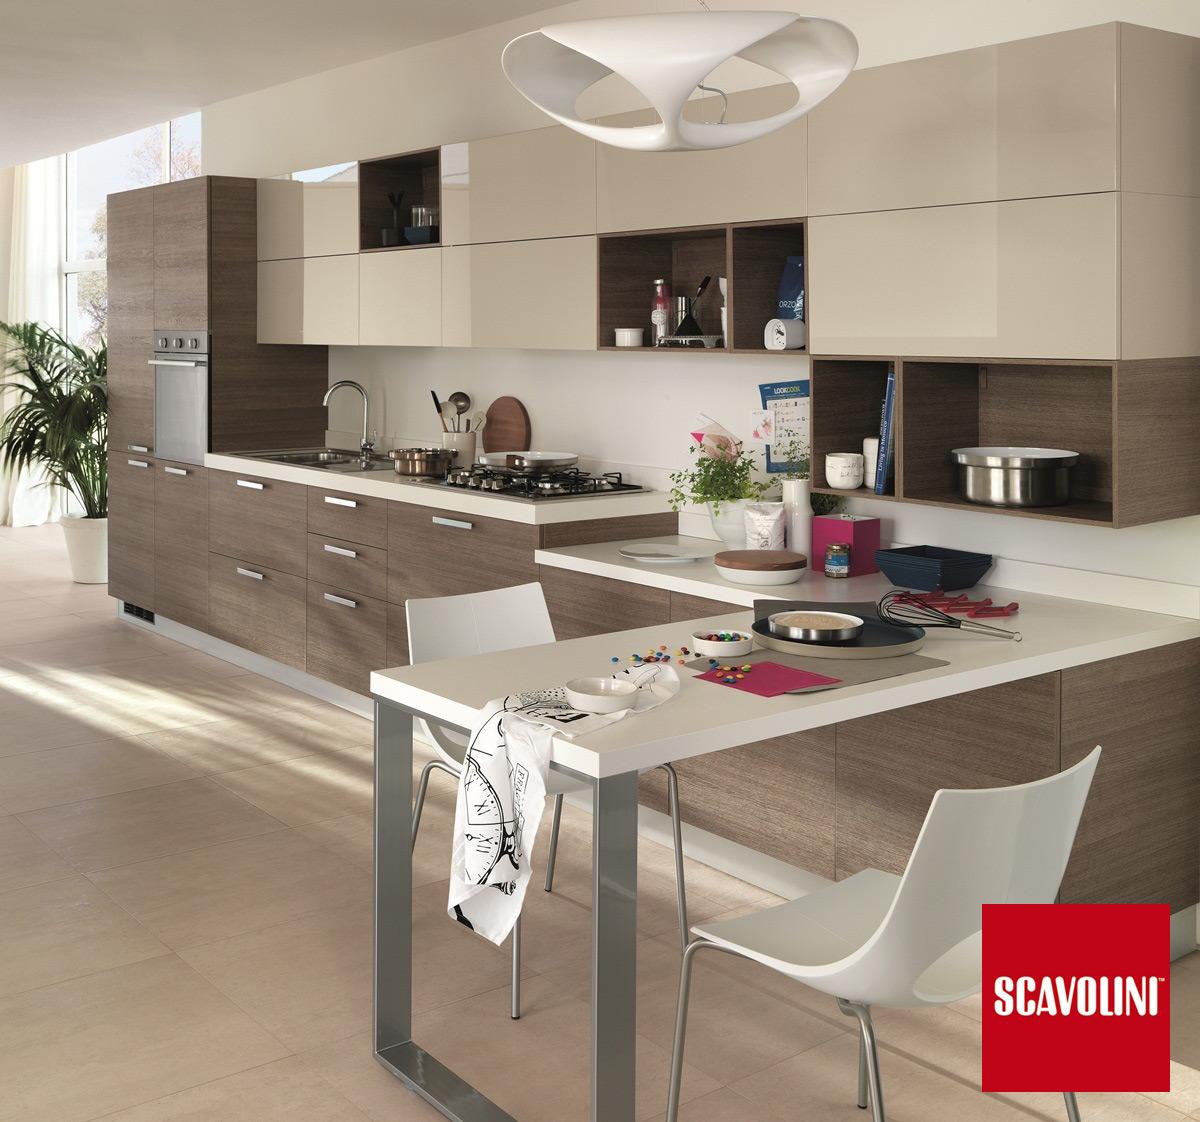 Cucina scavolini sax san gaetano arredamenti - Cucine scavolini basic ...